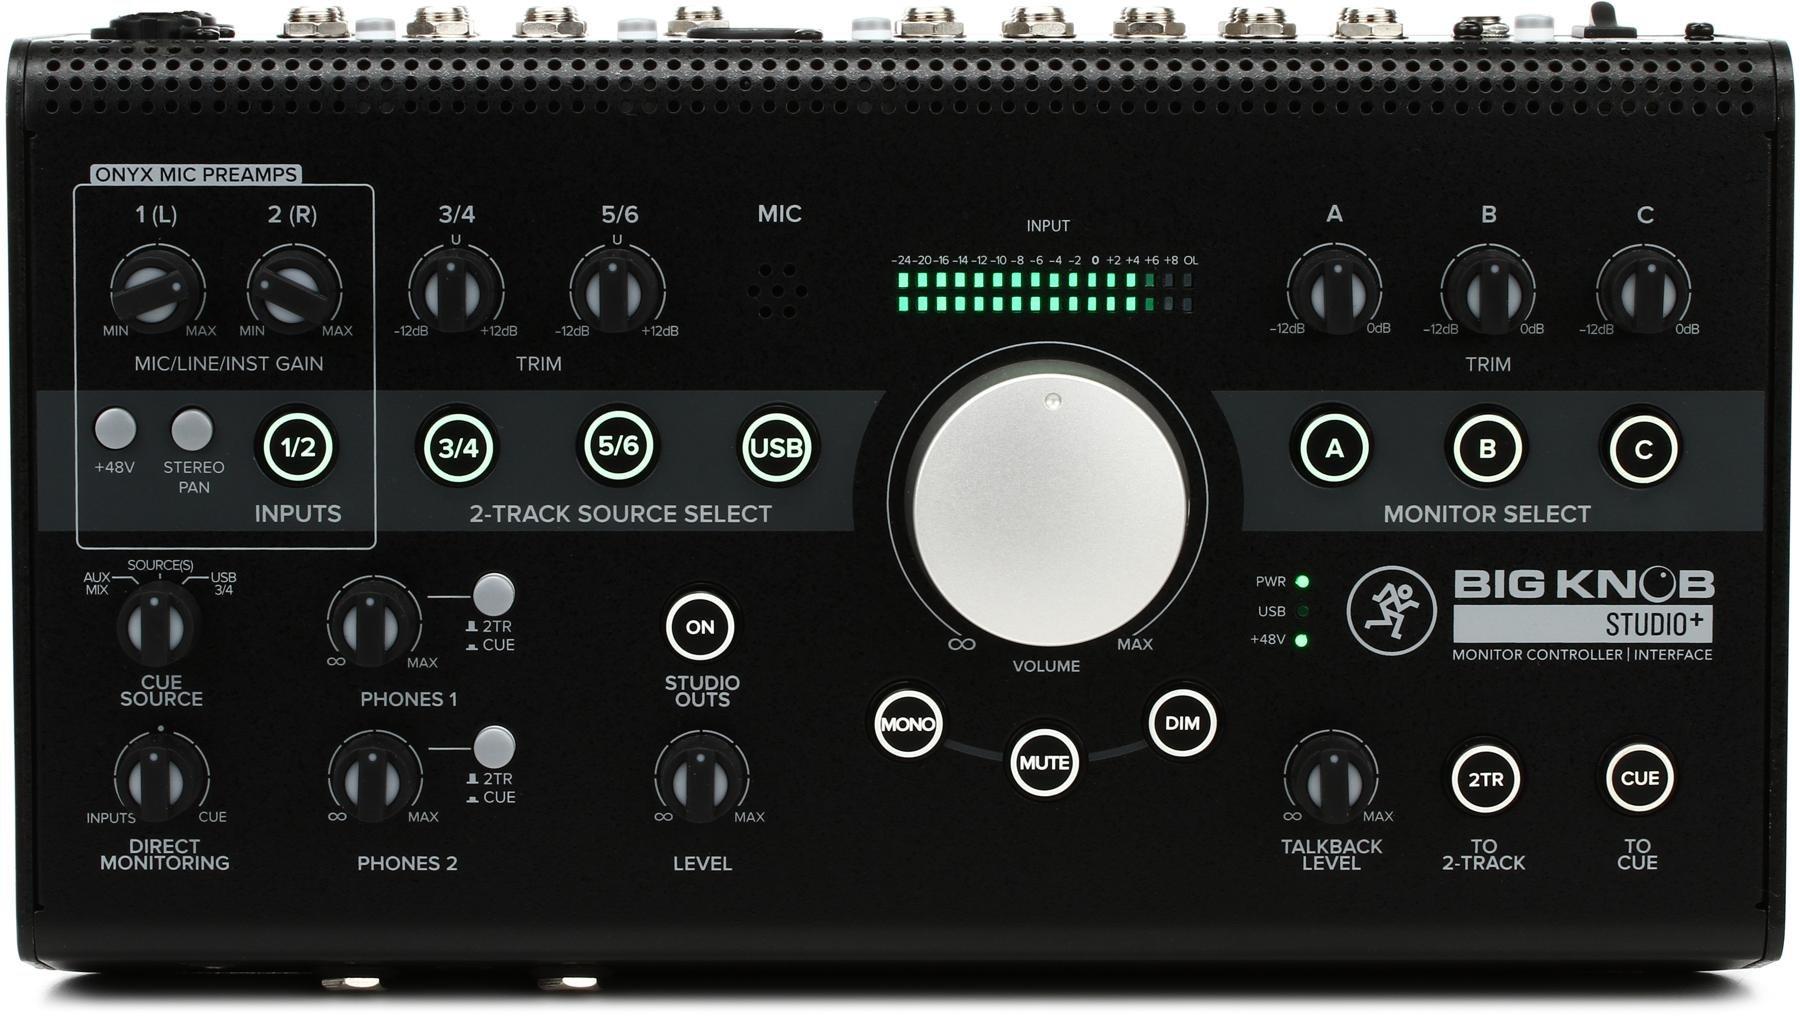 Mackie Big Knob Studio+ 4x3 Studio Monitor Controller and Interface |  Sweetwater